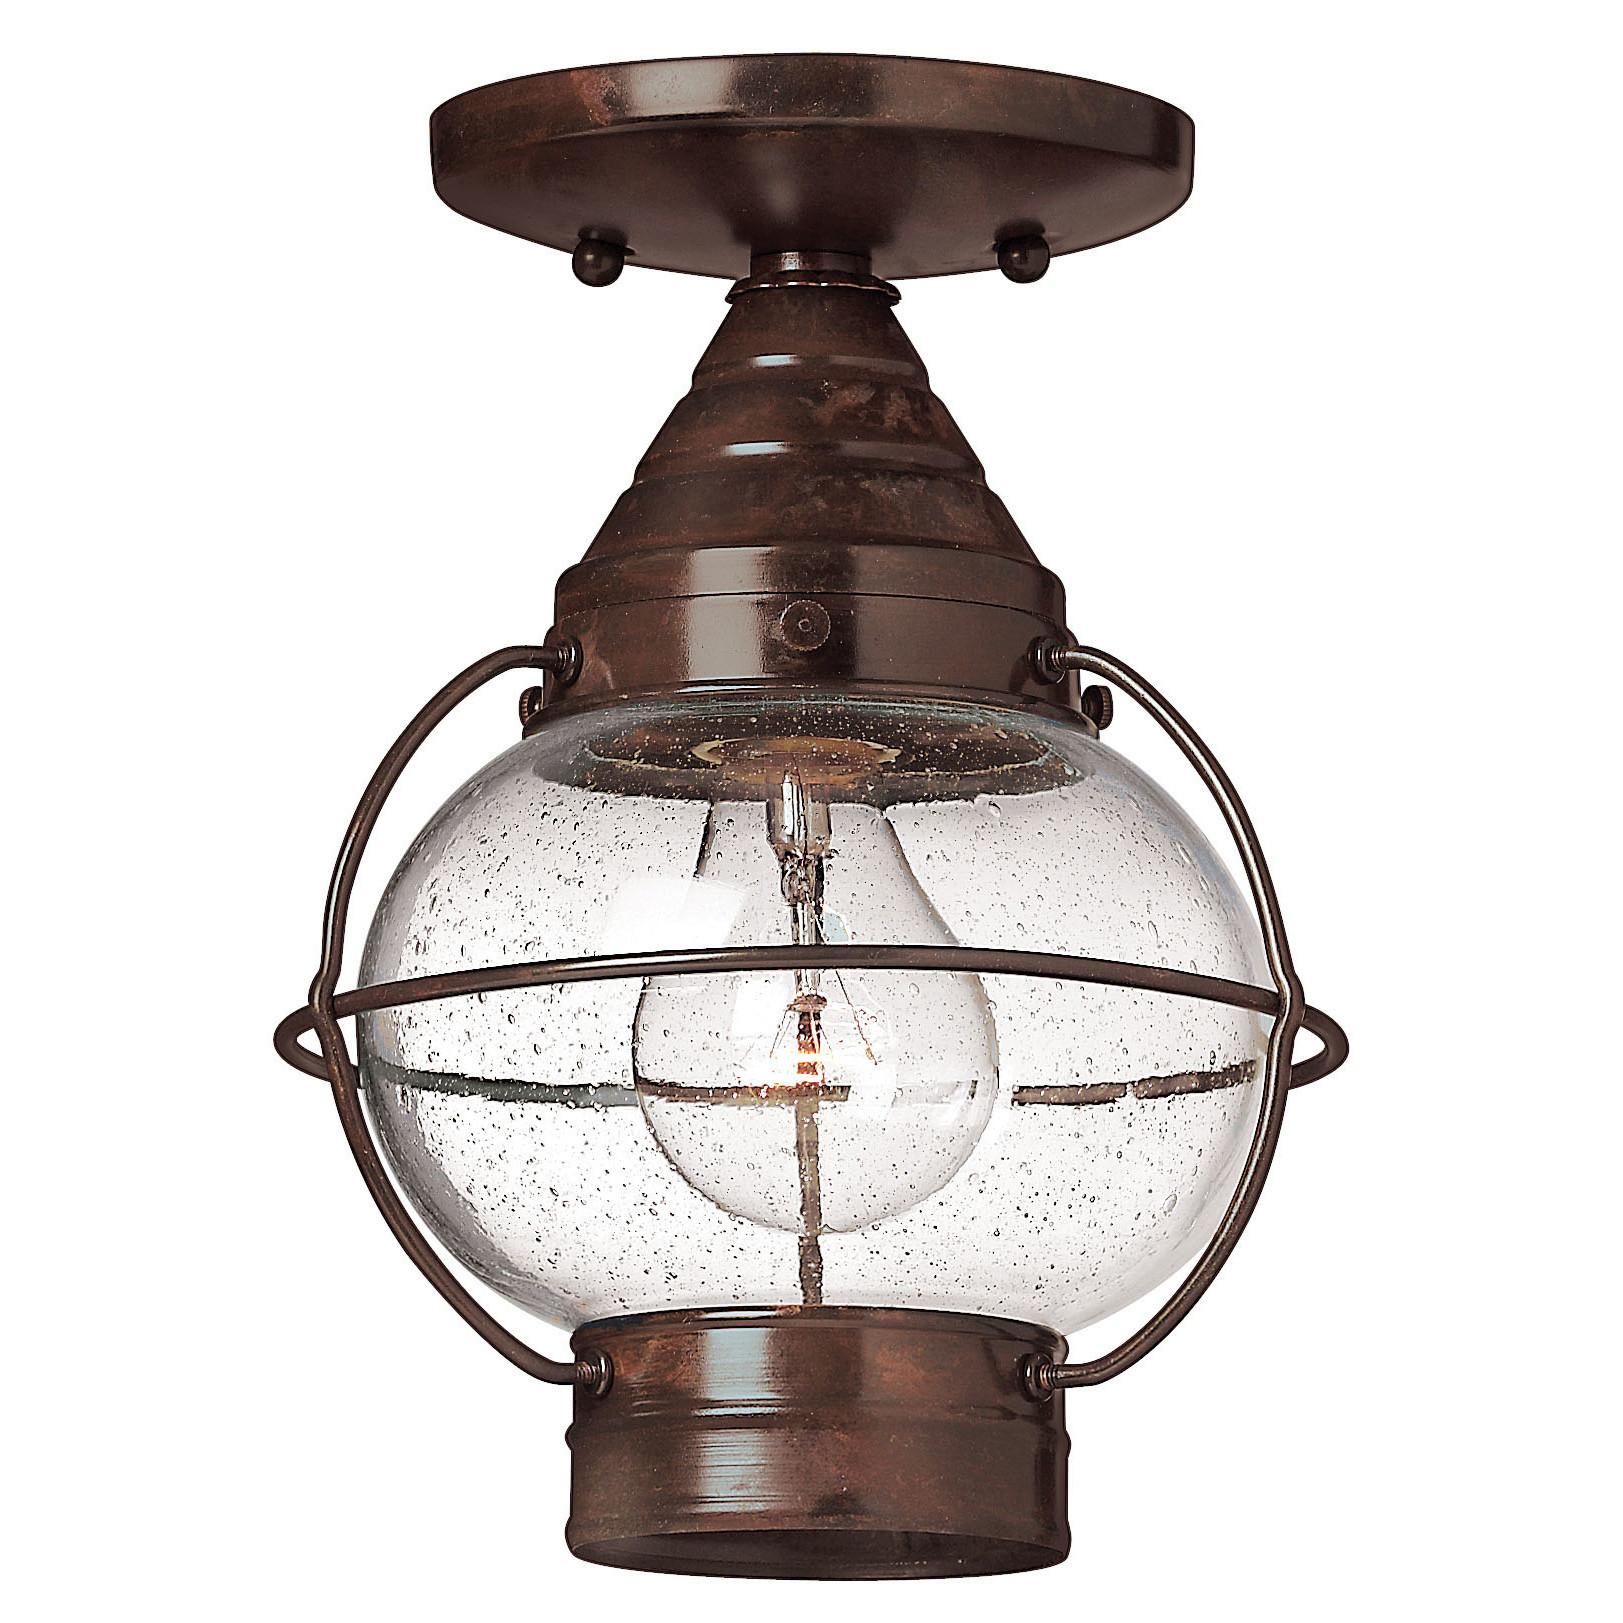 Best ideas about Semi Flush Mount Lighting . Save or Pin Hinkley Lighting Cape Cod 1 Light Semi Flush Mount Now.